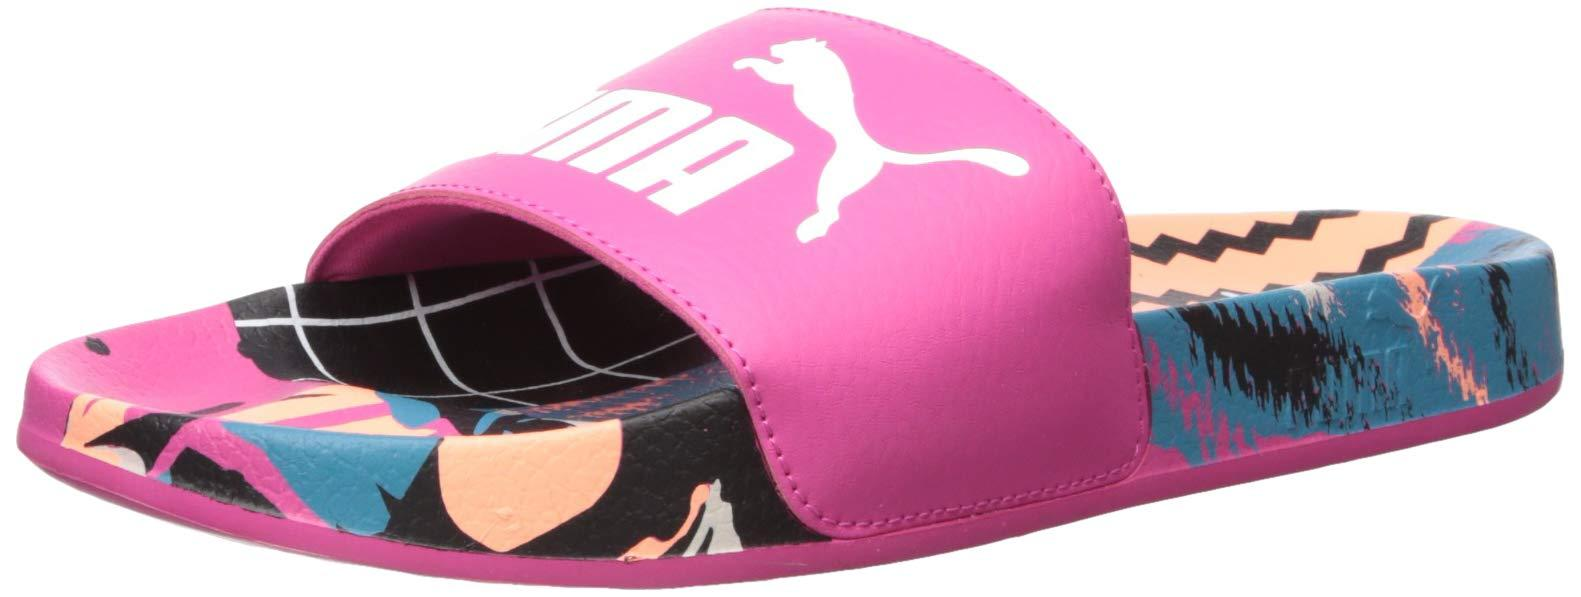 PUMA Rubber Leadcat Jelly Womens Slide Sandals in Black